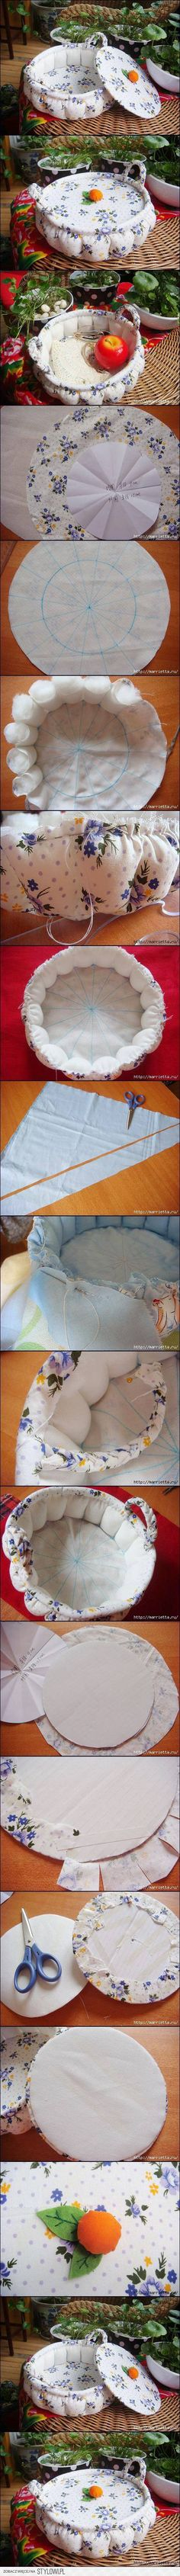 DIY Soft Fabric Needlework Basket DIY Projects   Useful…